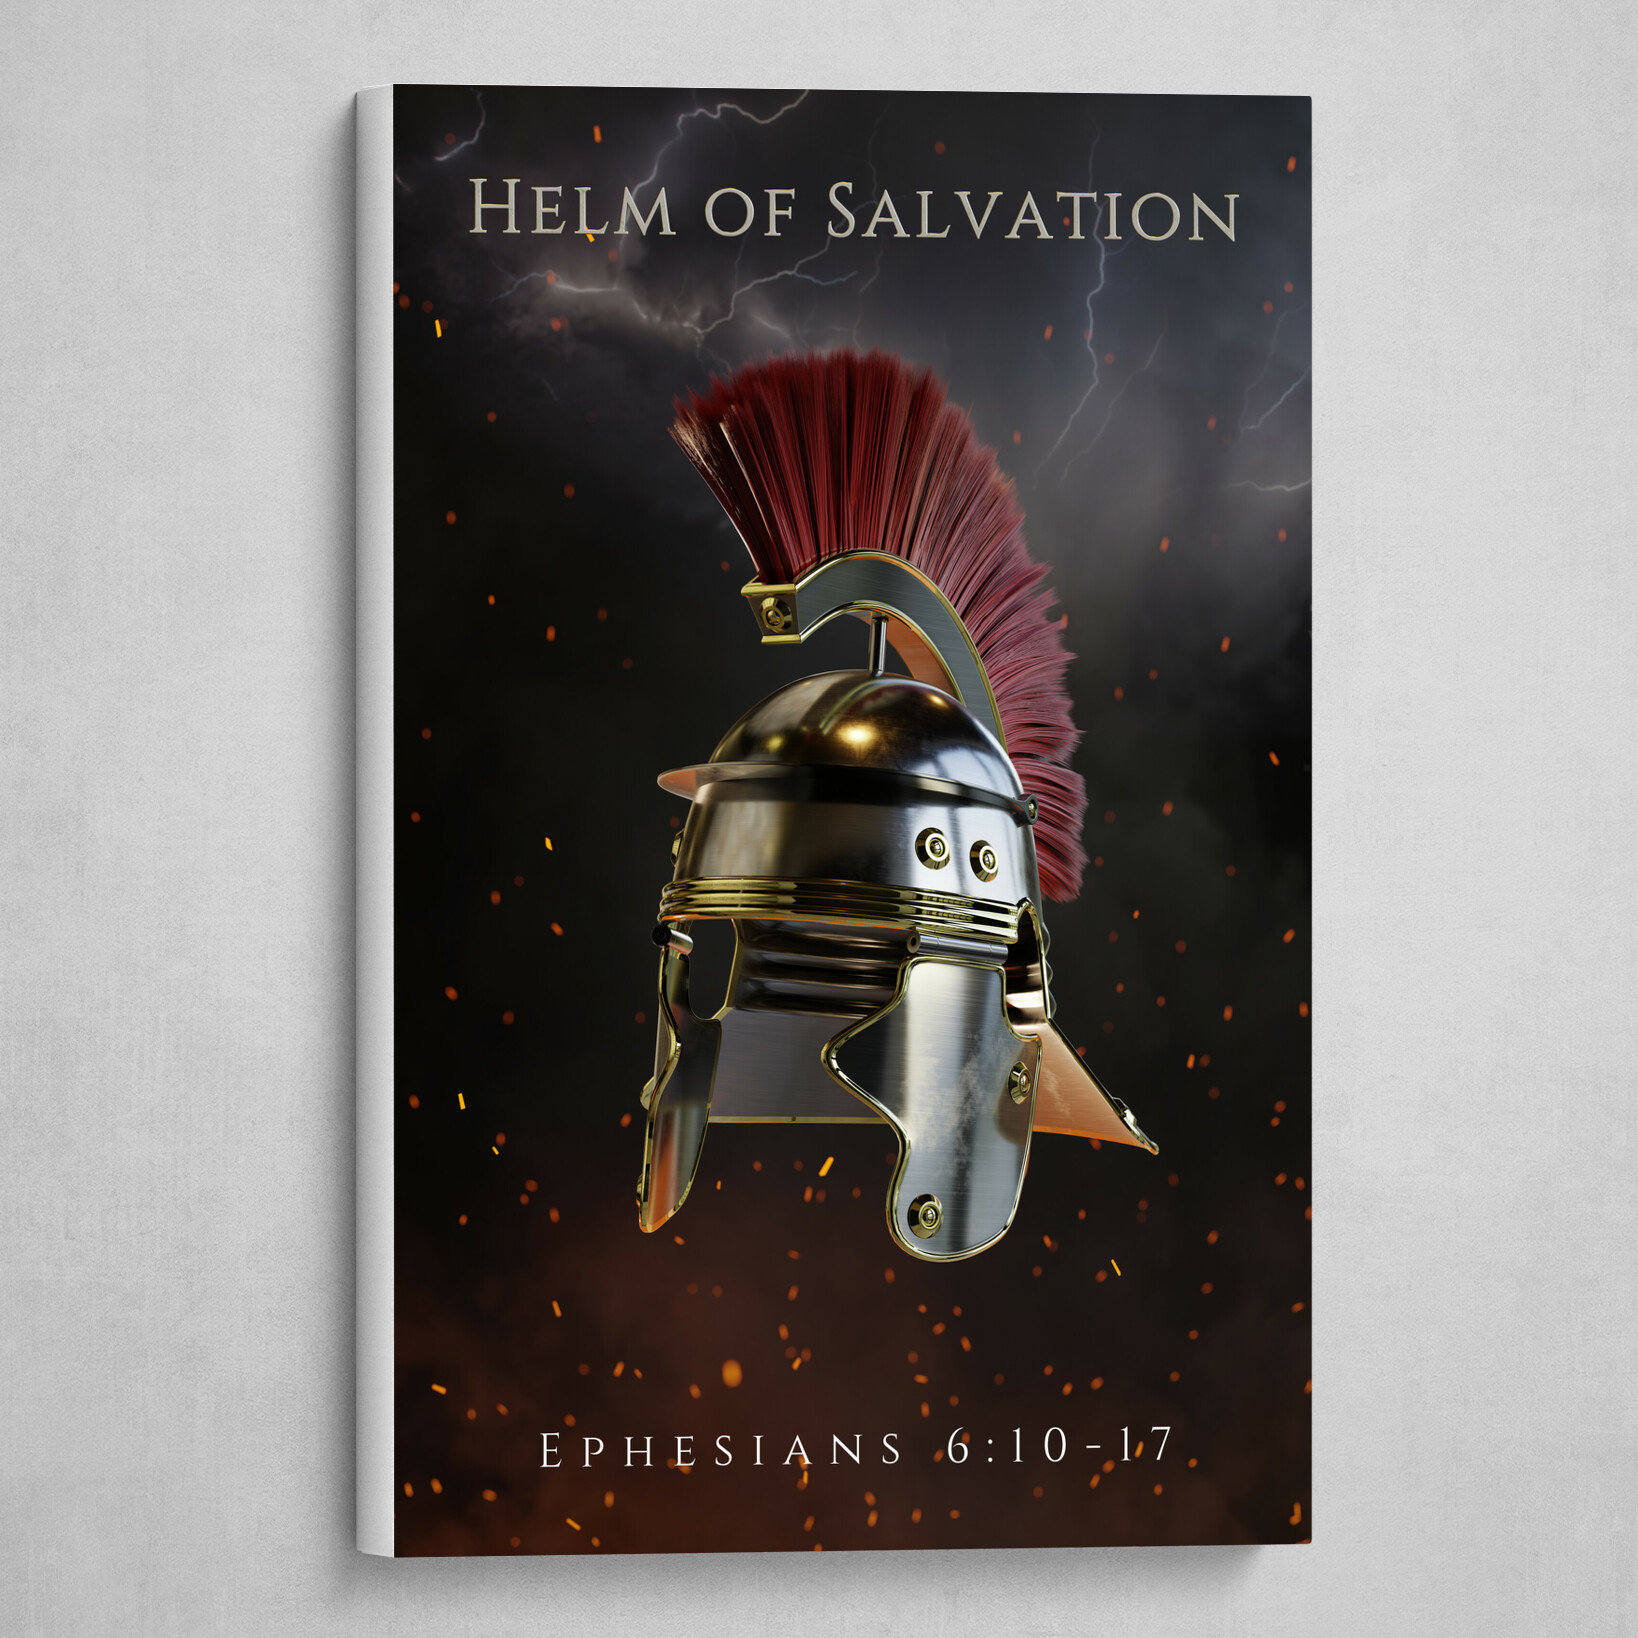 Helm of Salvation